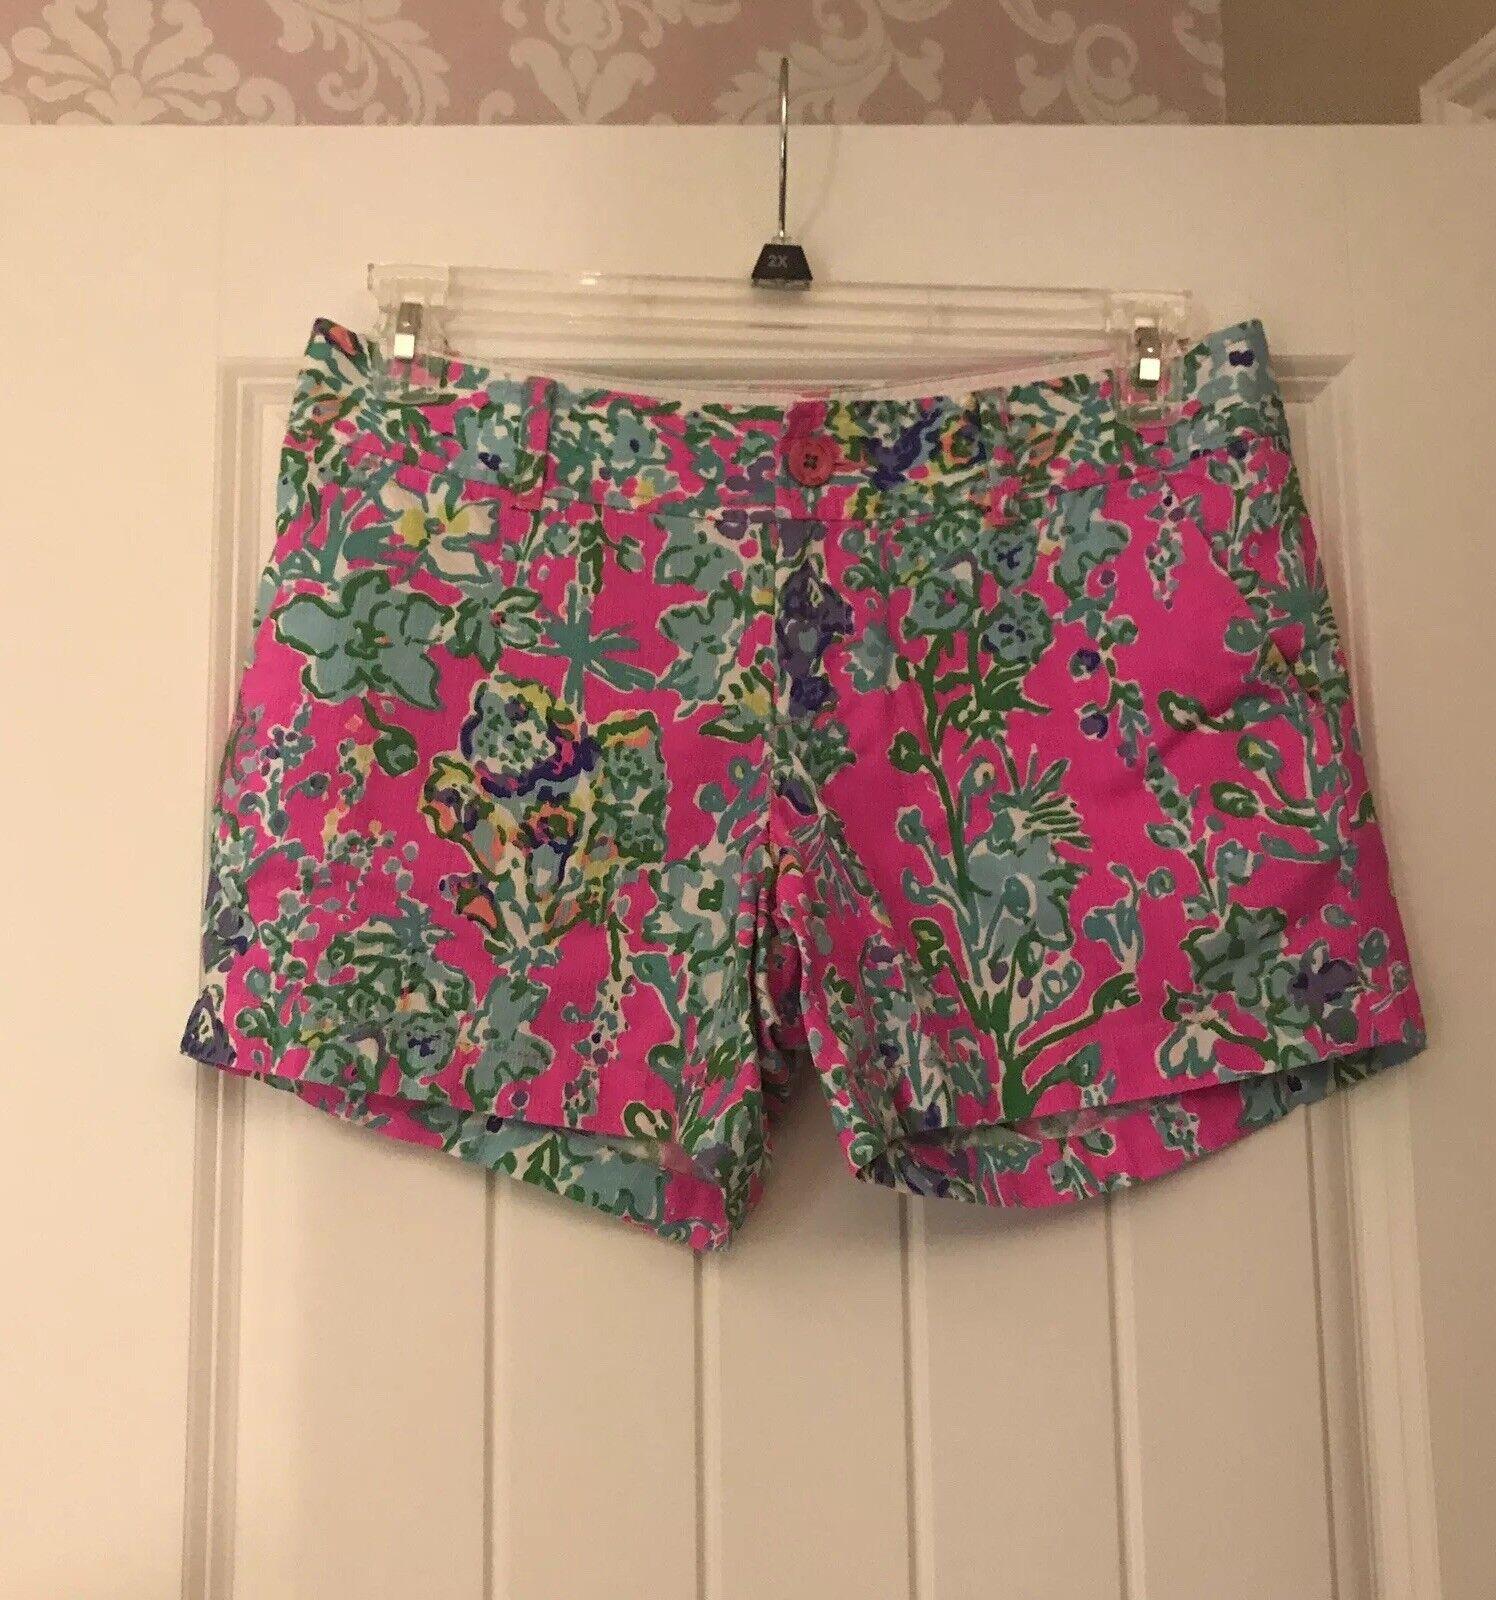 Lilly Pulitzer Southern Charm Callahan Shorts 6 Original colorway Floral